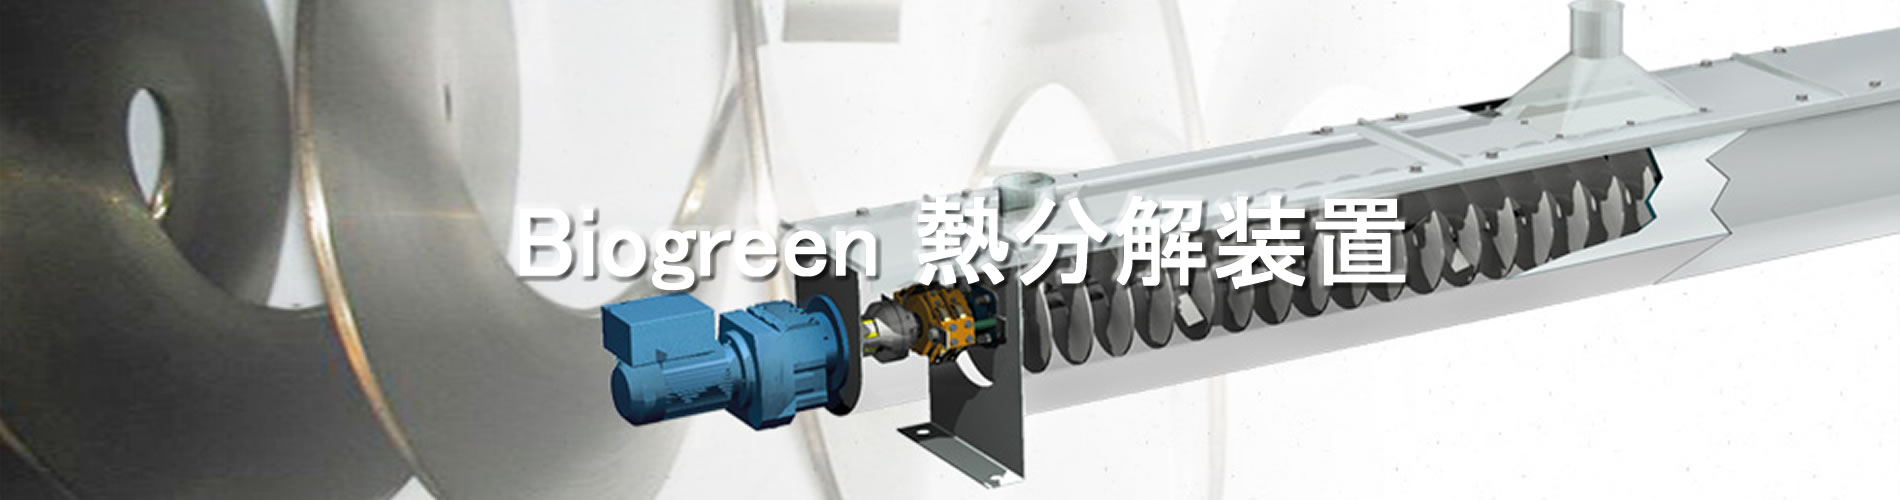 Biogreen 熱分解装置